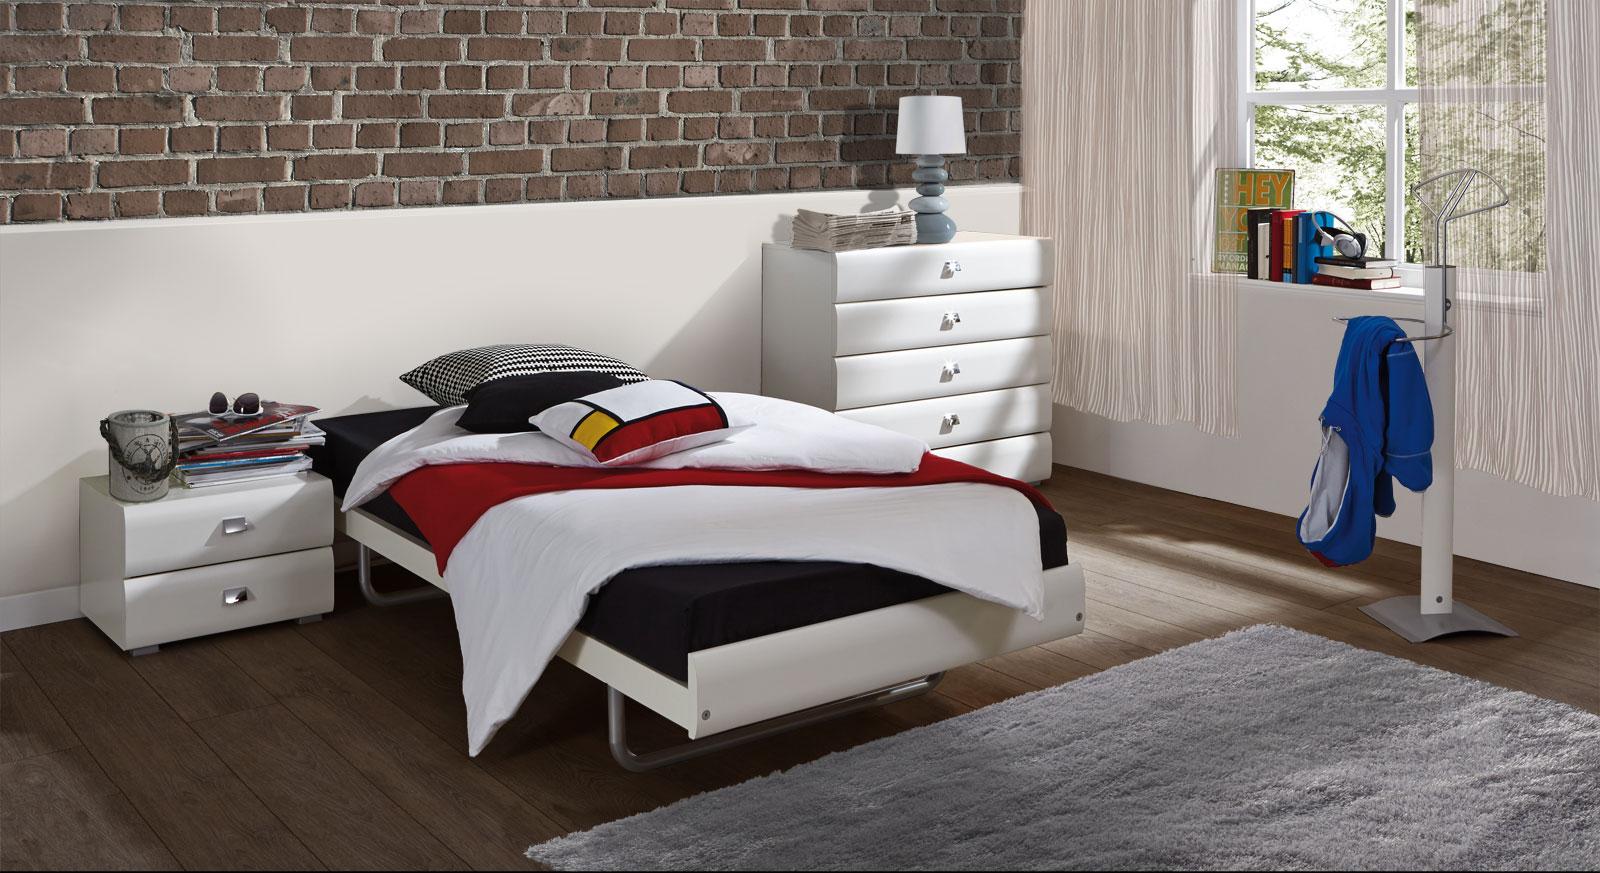 Bett Celaya mit passenden Produkten